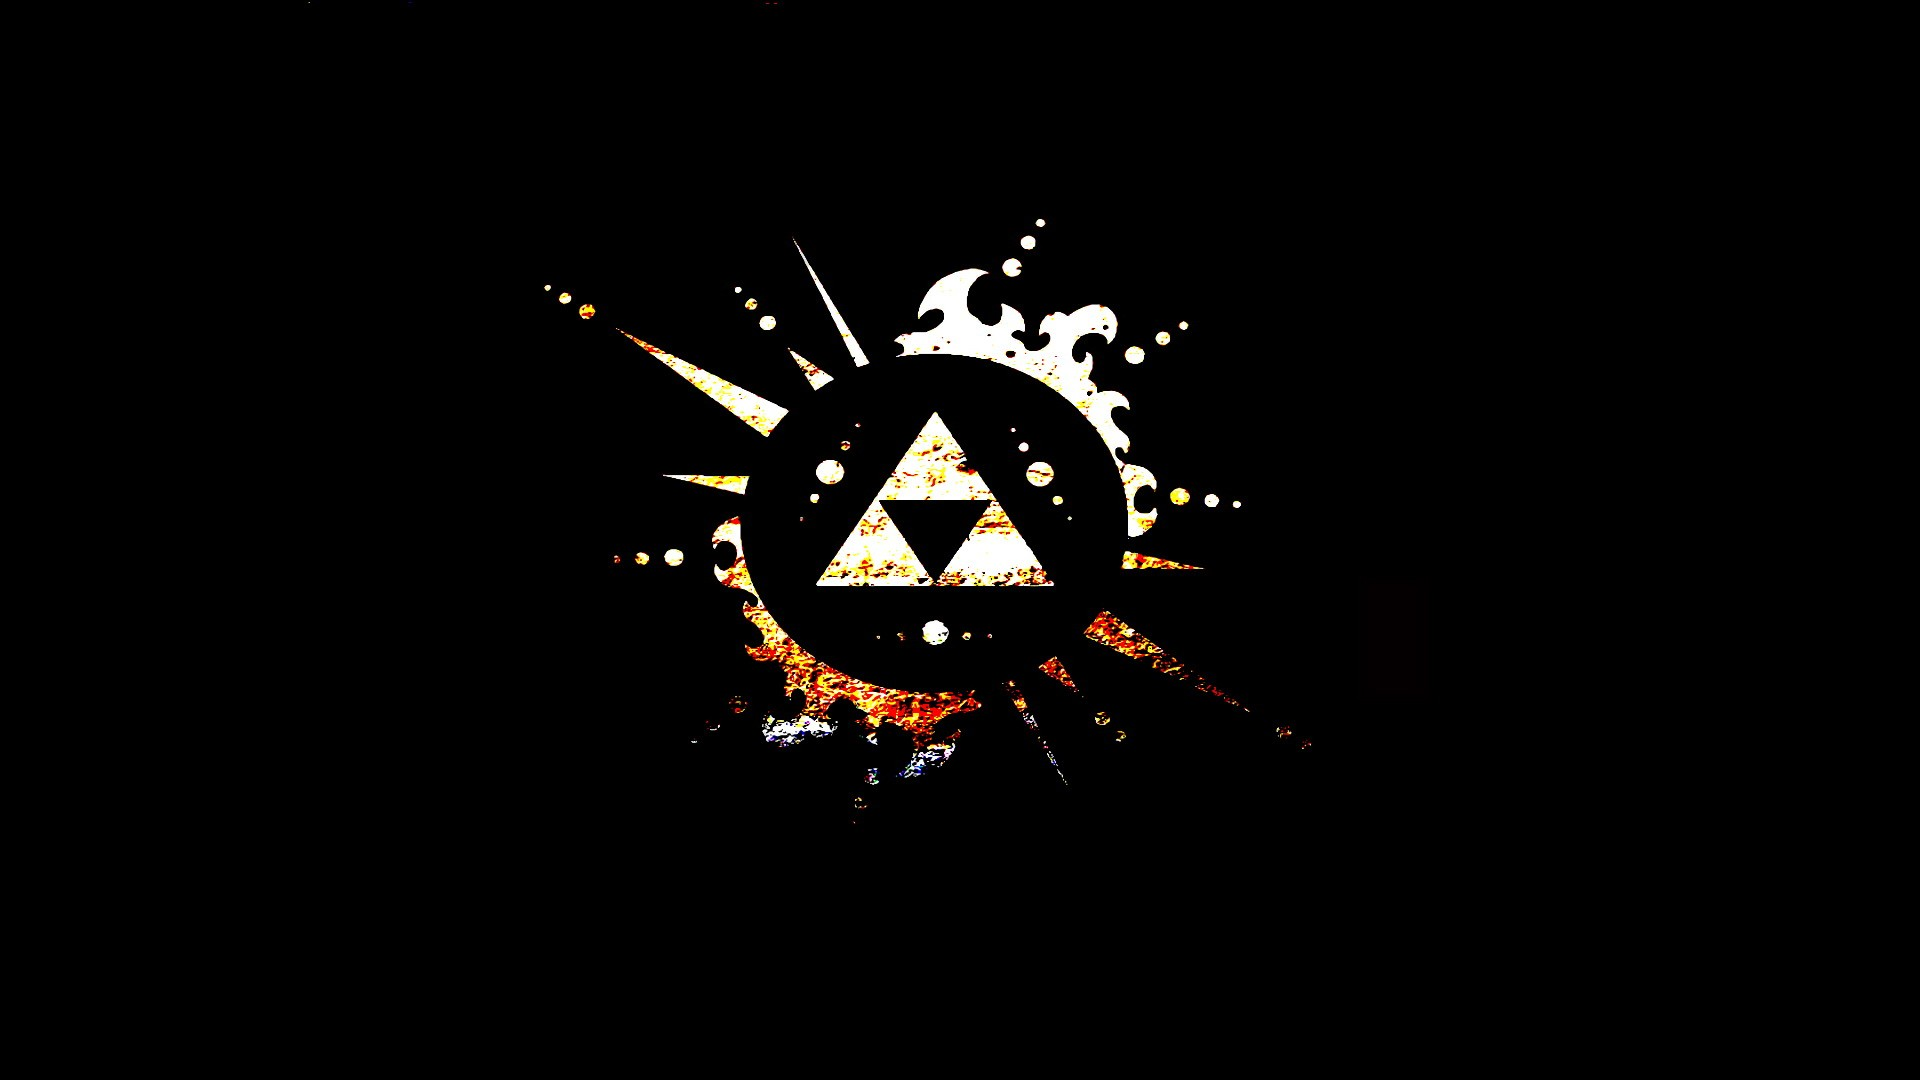 Hd wallpaper zelda - Triforce The Wallpaper 1920x1080 Triforce The Legend Of Zelda